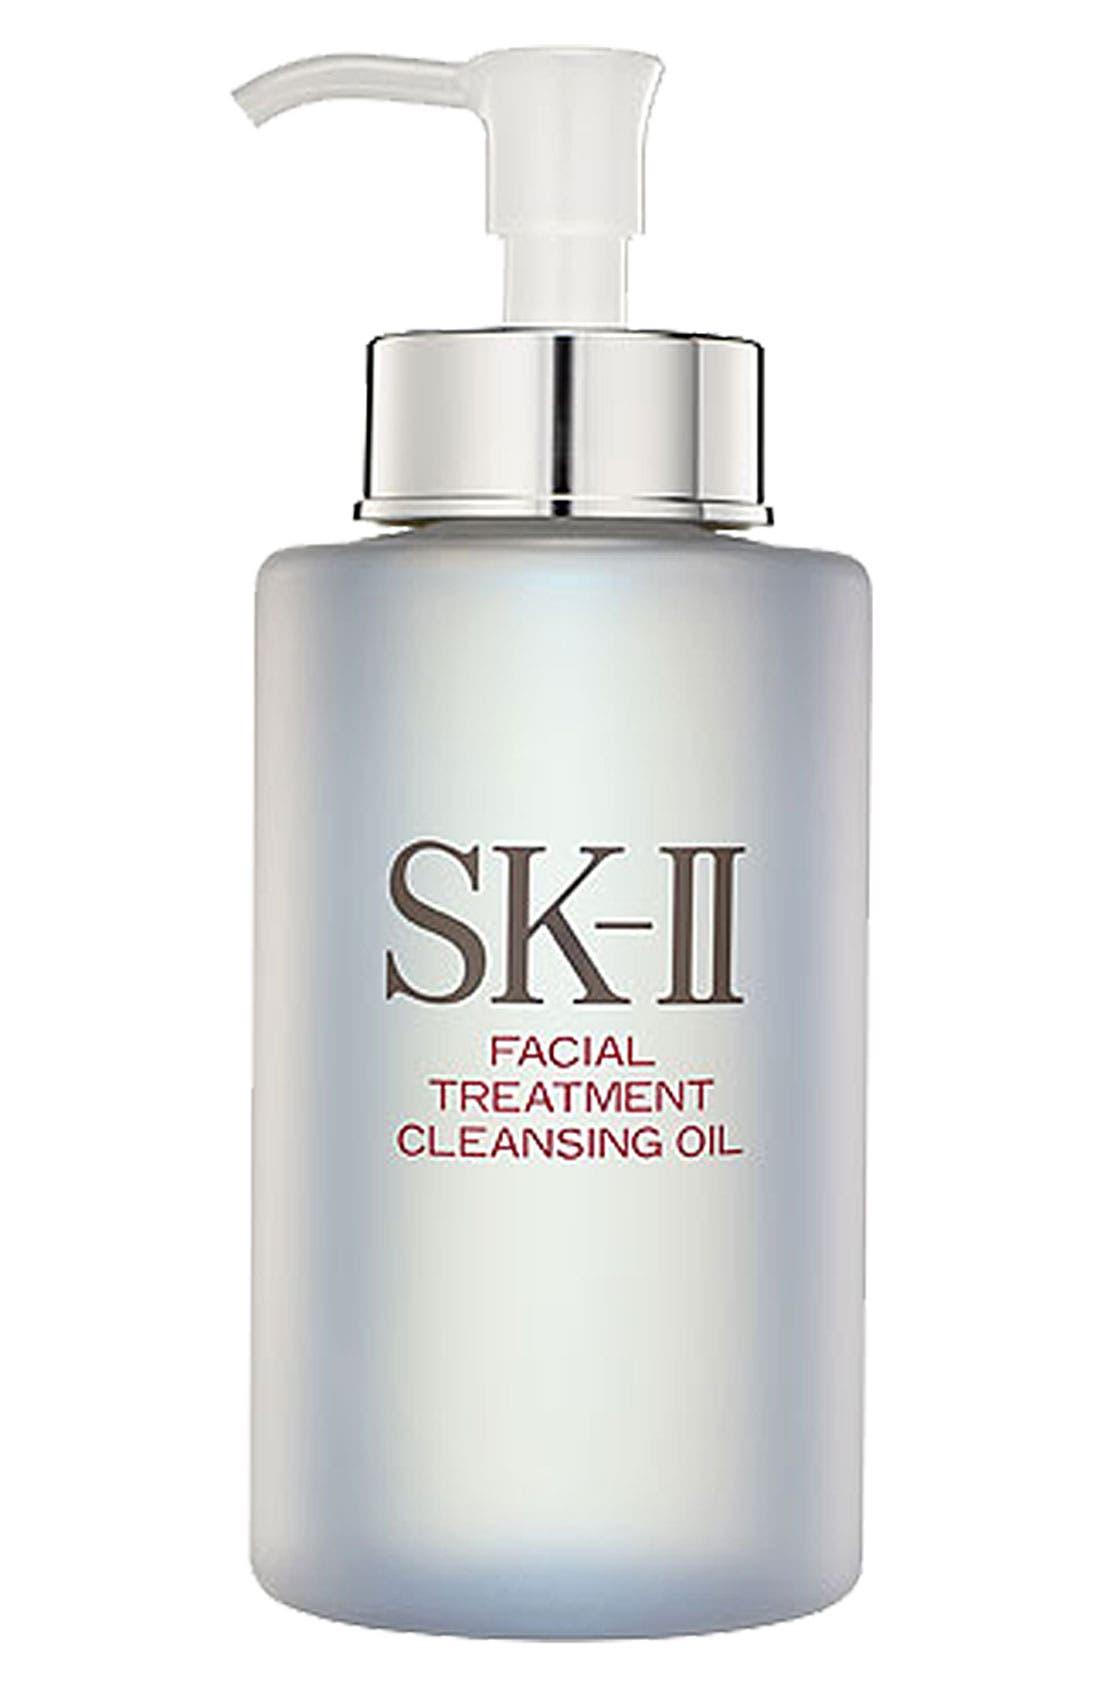 Facial Treatment Cleansing Oil,                             Main thumbnail 1, color,                             NO COLOR